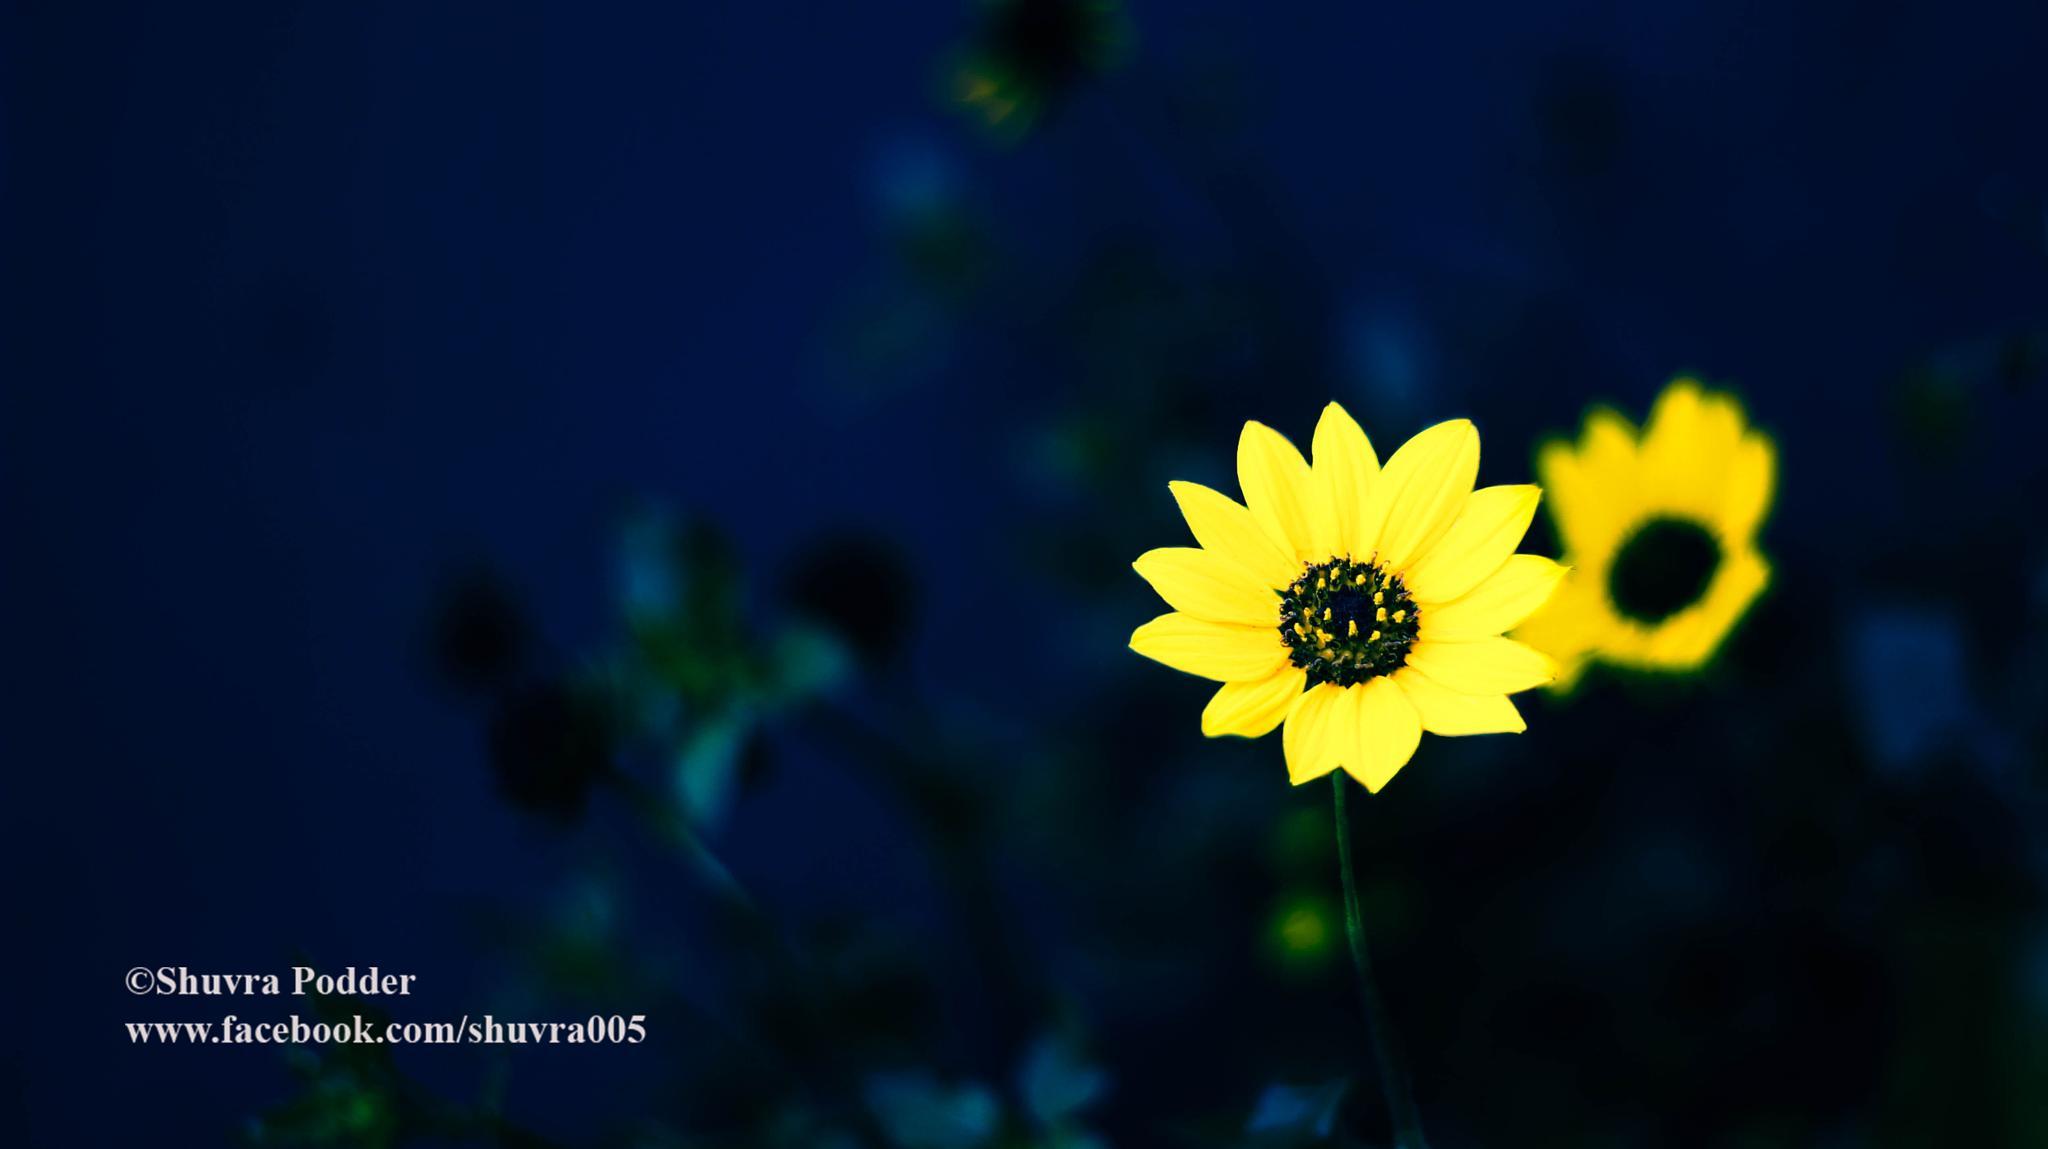 Untitled by Shuvra Podder